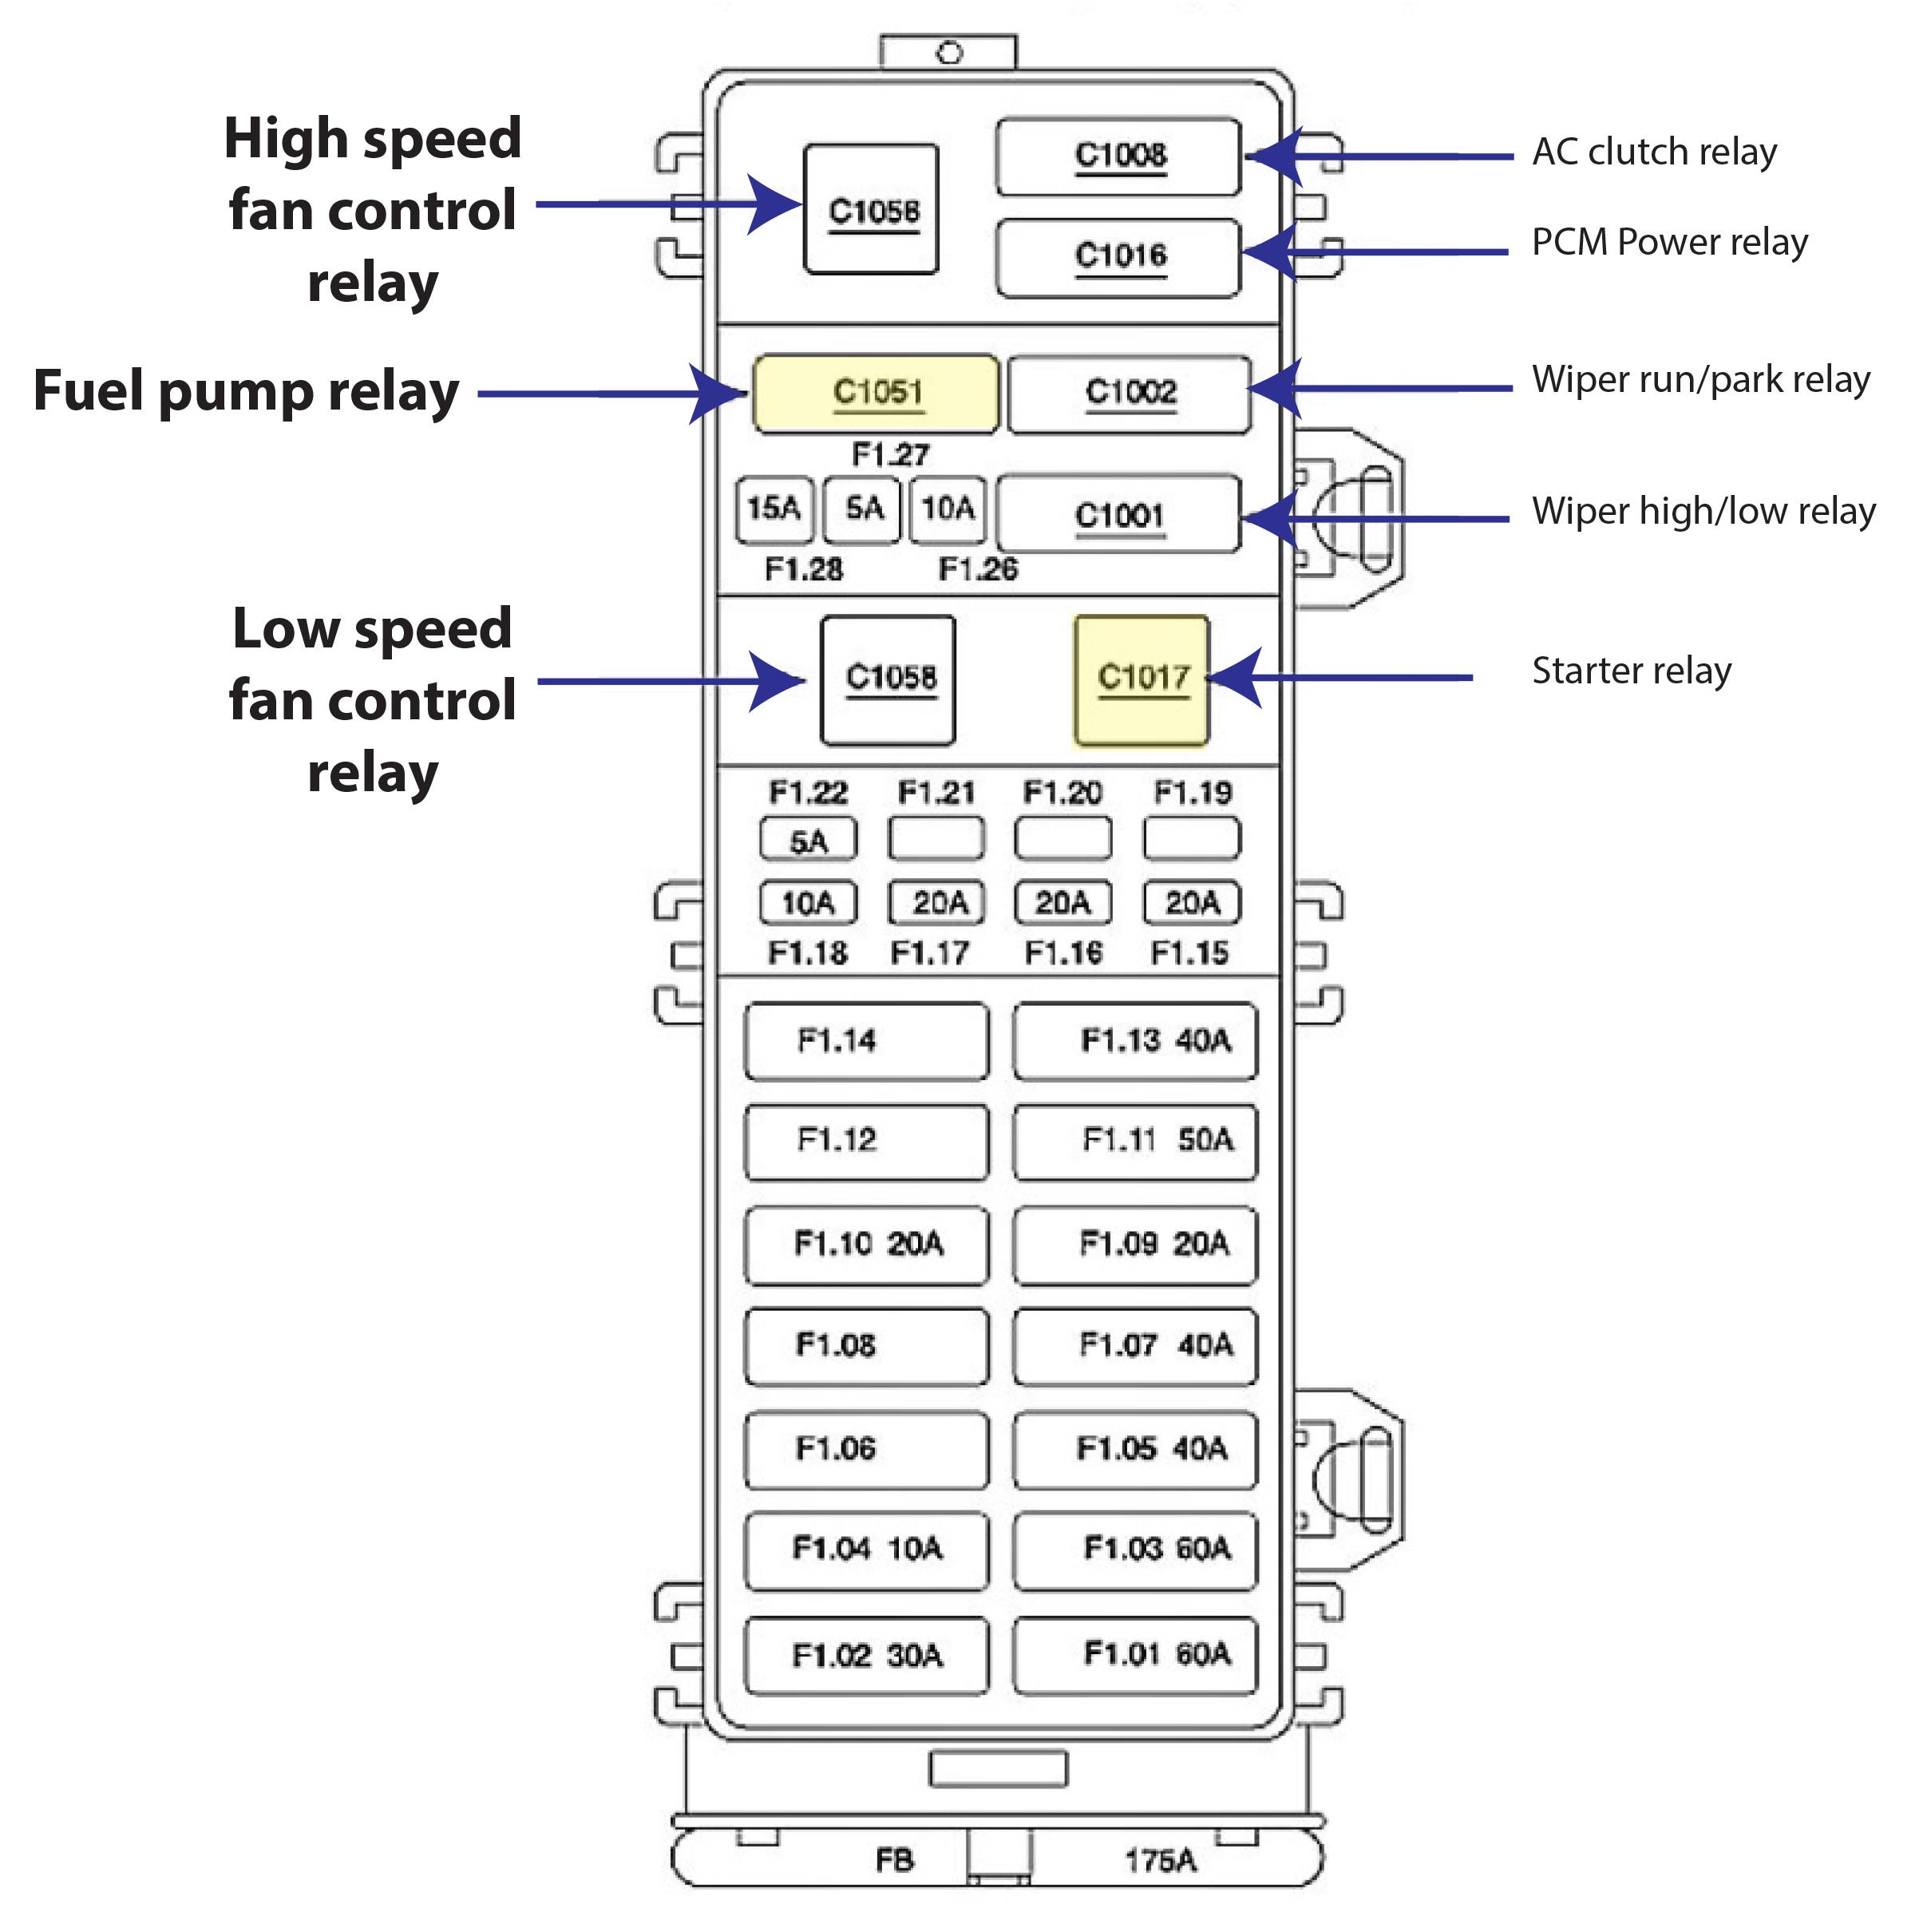 2006 Ford Taurus Fuse Diagrams — Ricks Free Auto Repair